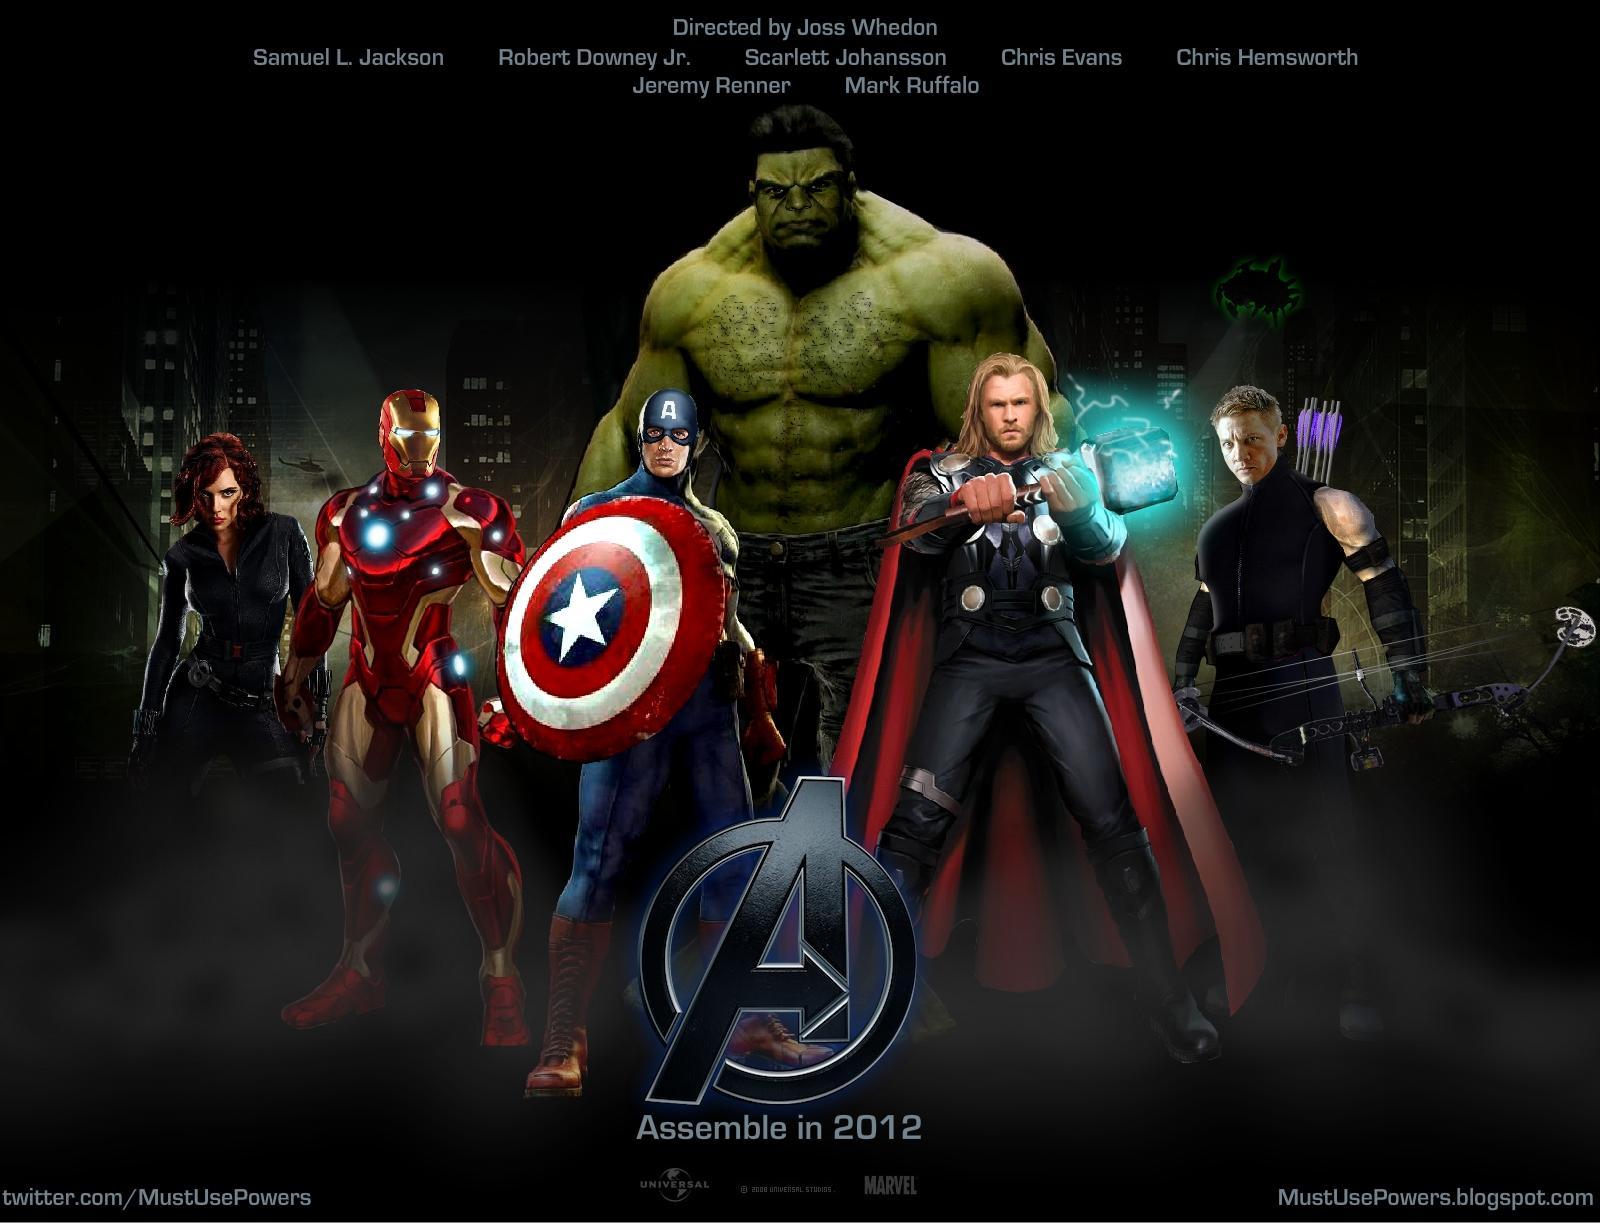 The avengers movie theme mp3 download : Heirs korean drama